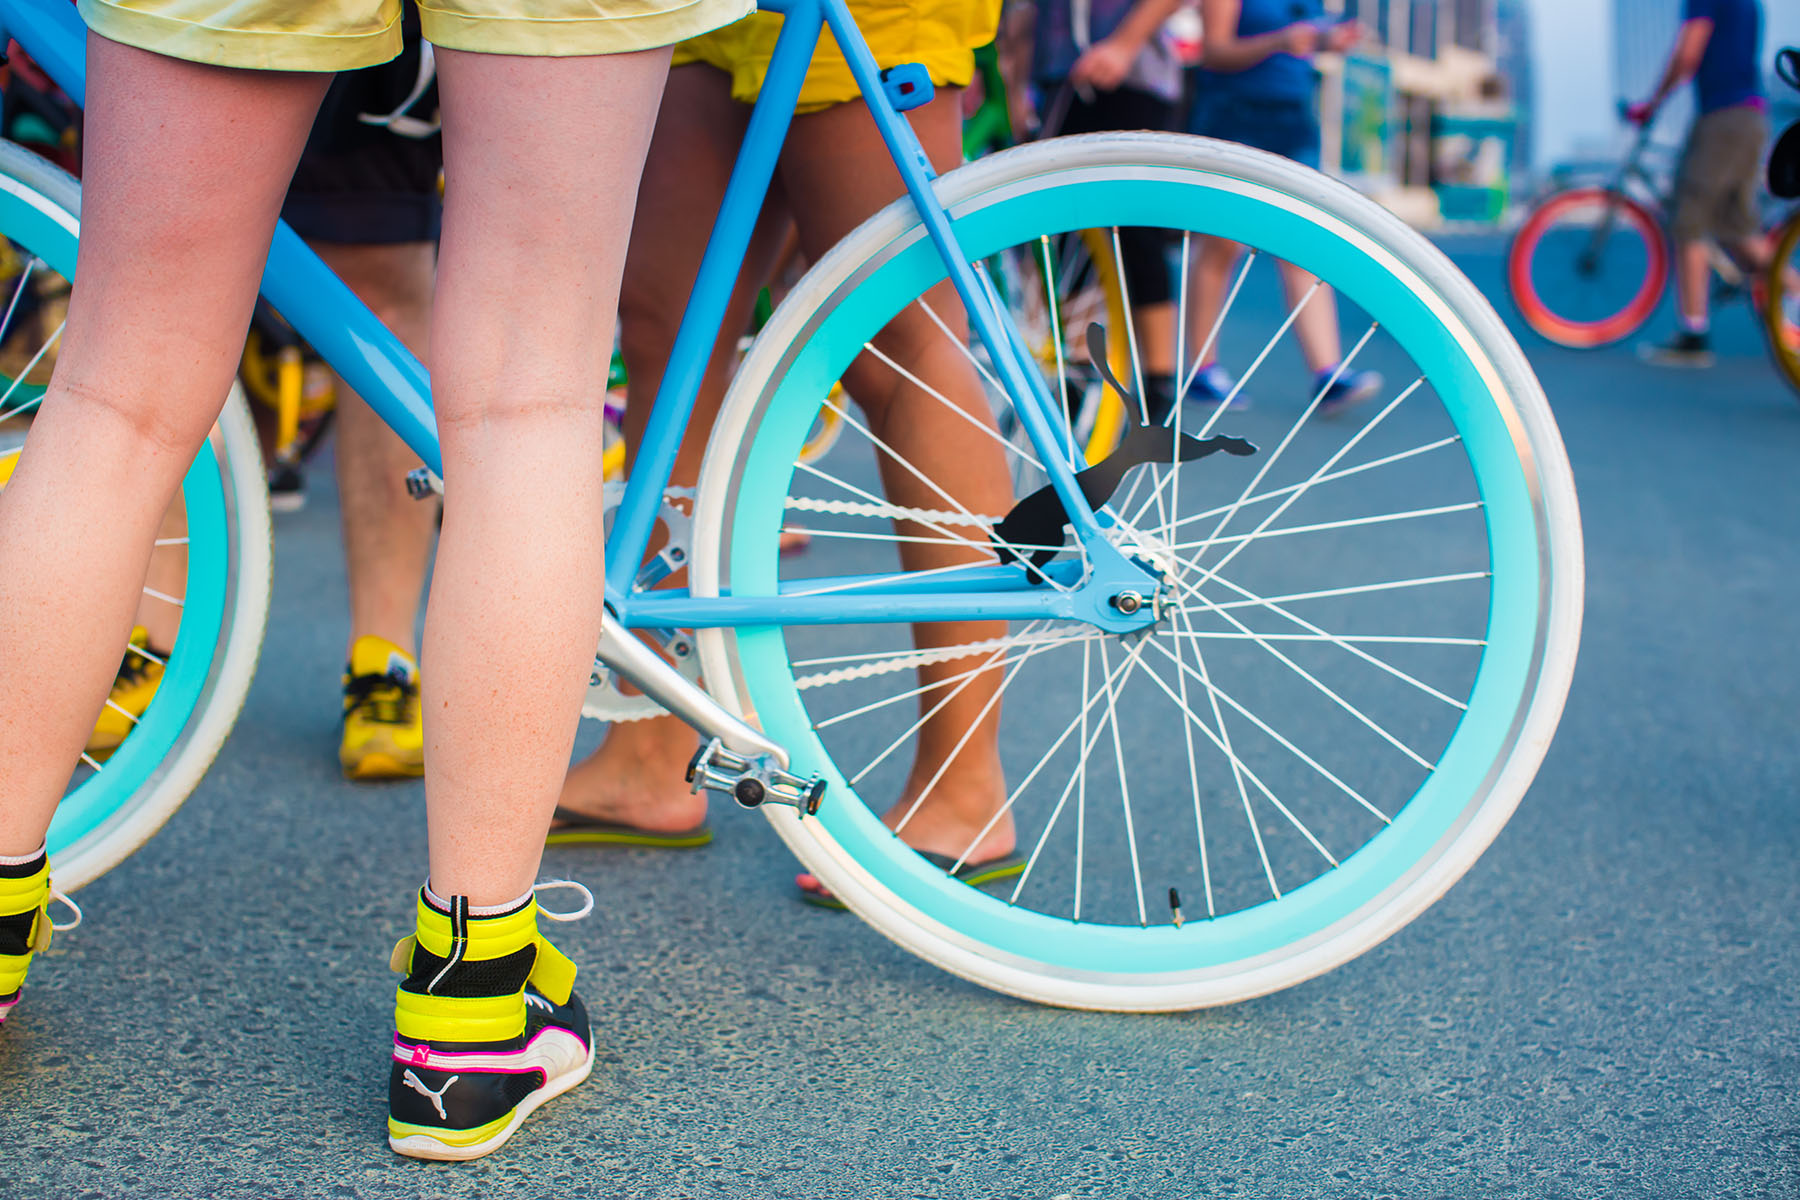 Fishtail ride bike at the PUMA event by Loesje Kessels Fashion Photographer Dubai